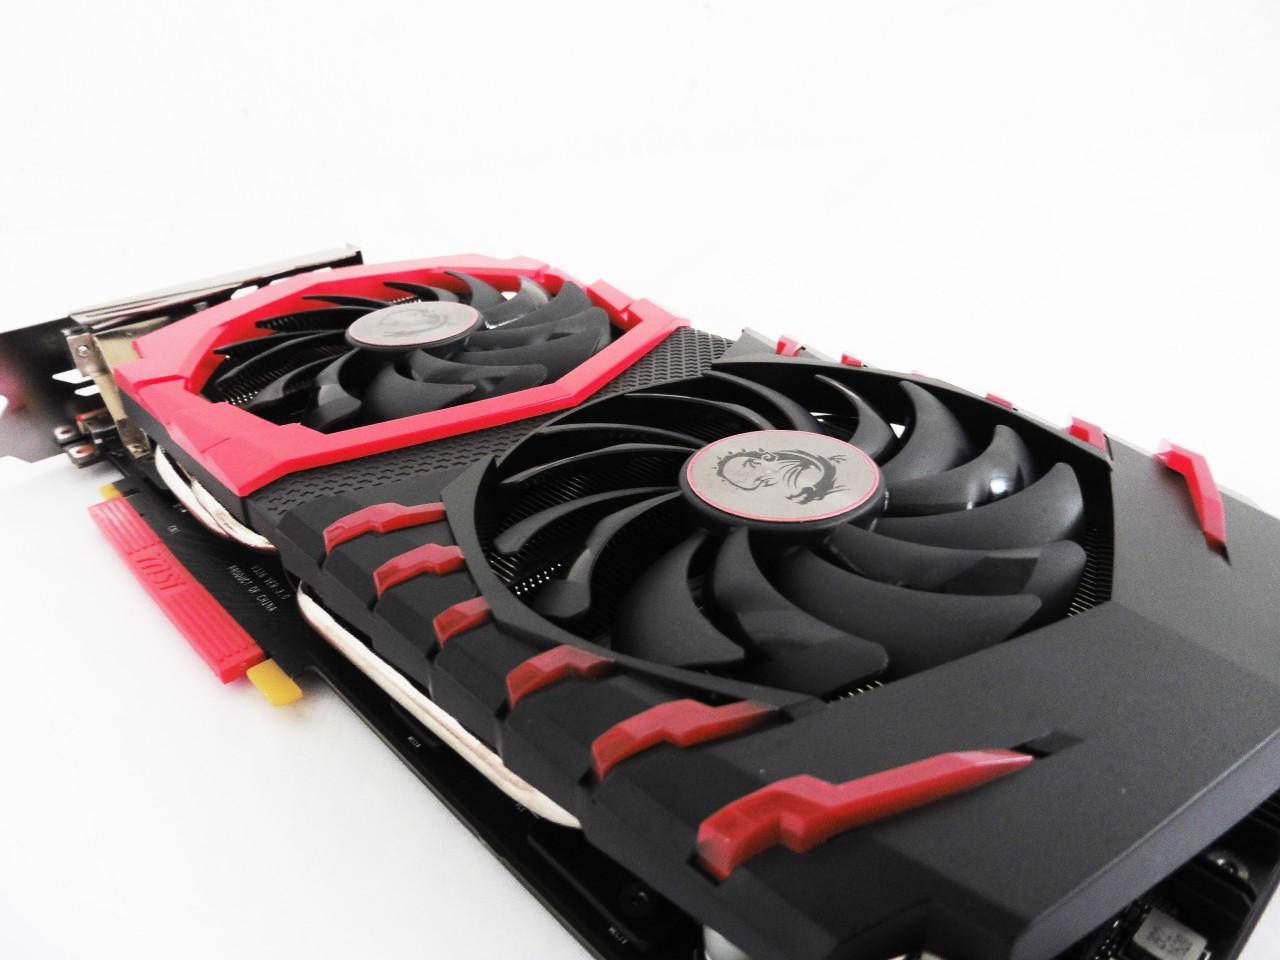 MSI GeForce GTX 1080 Gaming X 8G Review 5